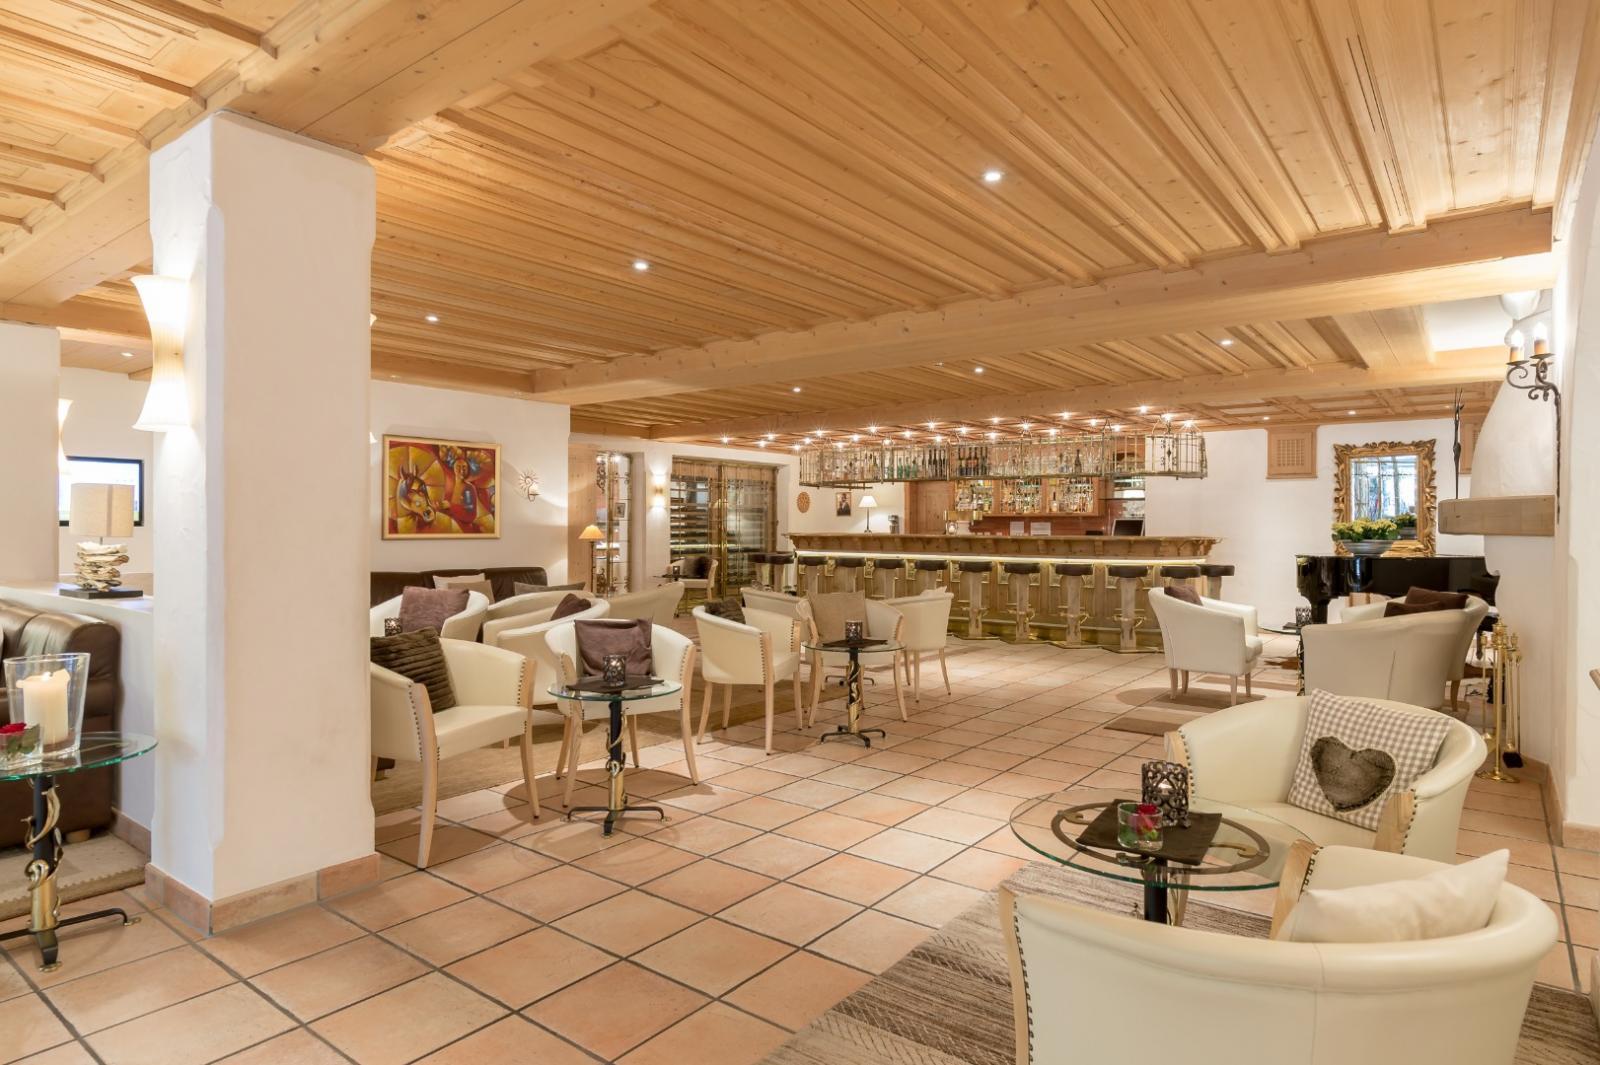 Chasa montana hotel spa samnaun hotelbewertung for Arredamento centro estetico usato